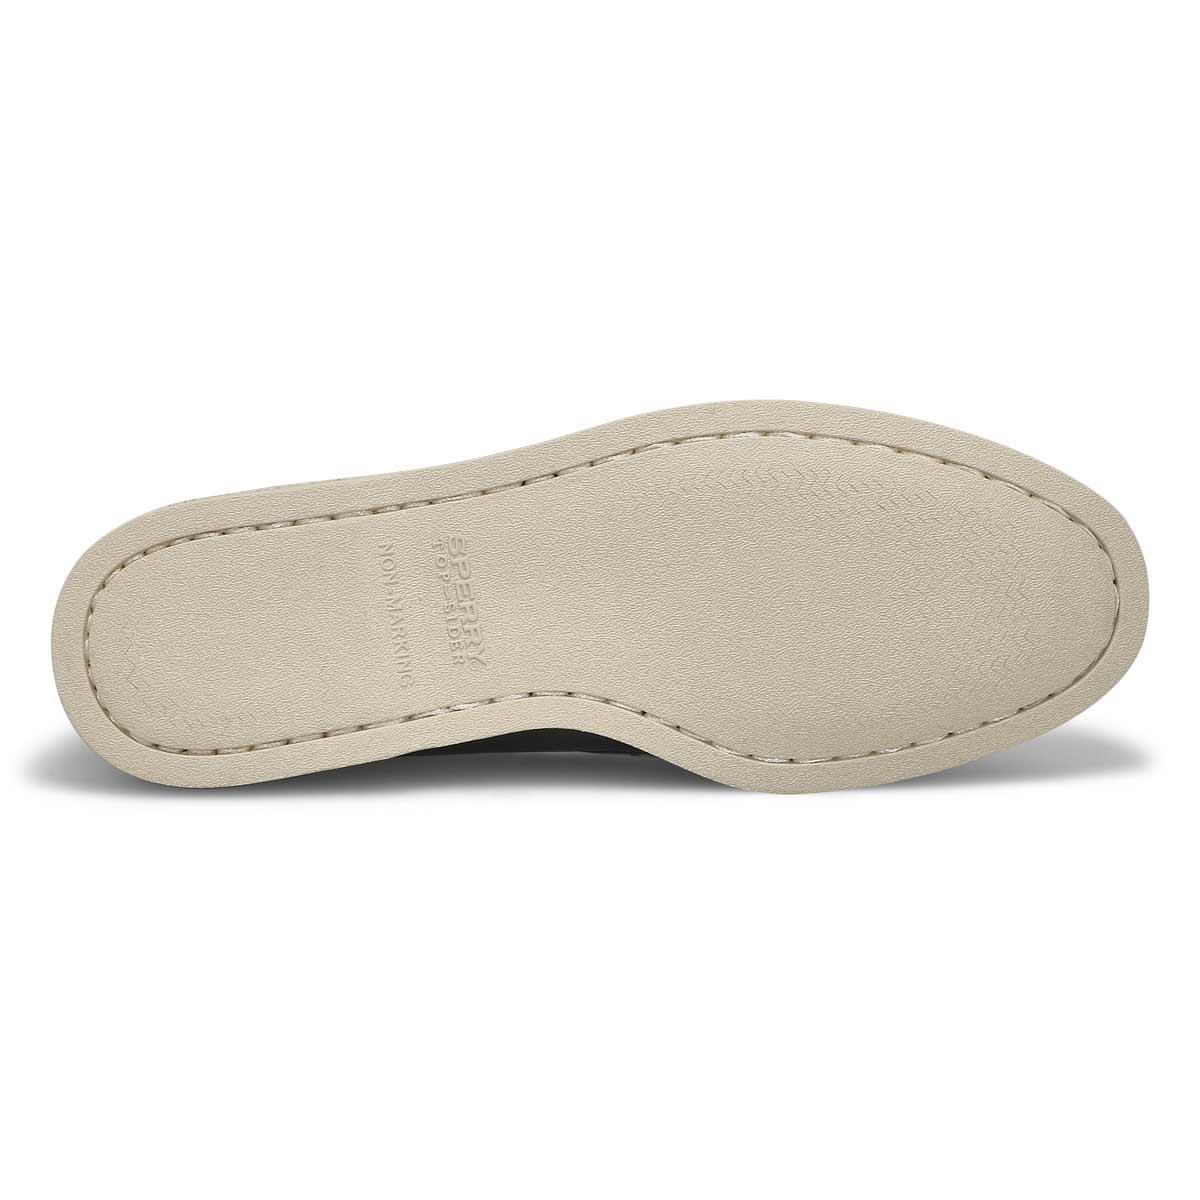 Mns A/O 2-eye navy boat shoe